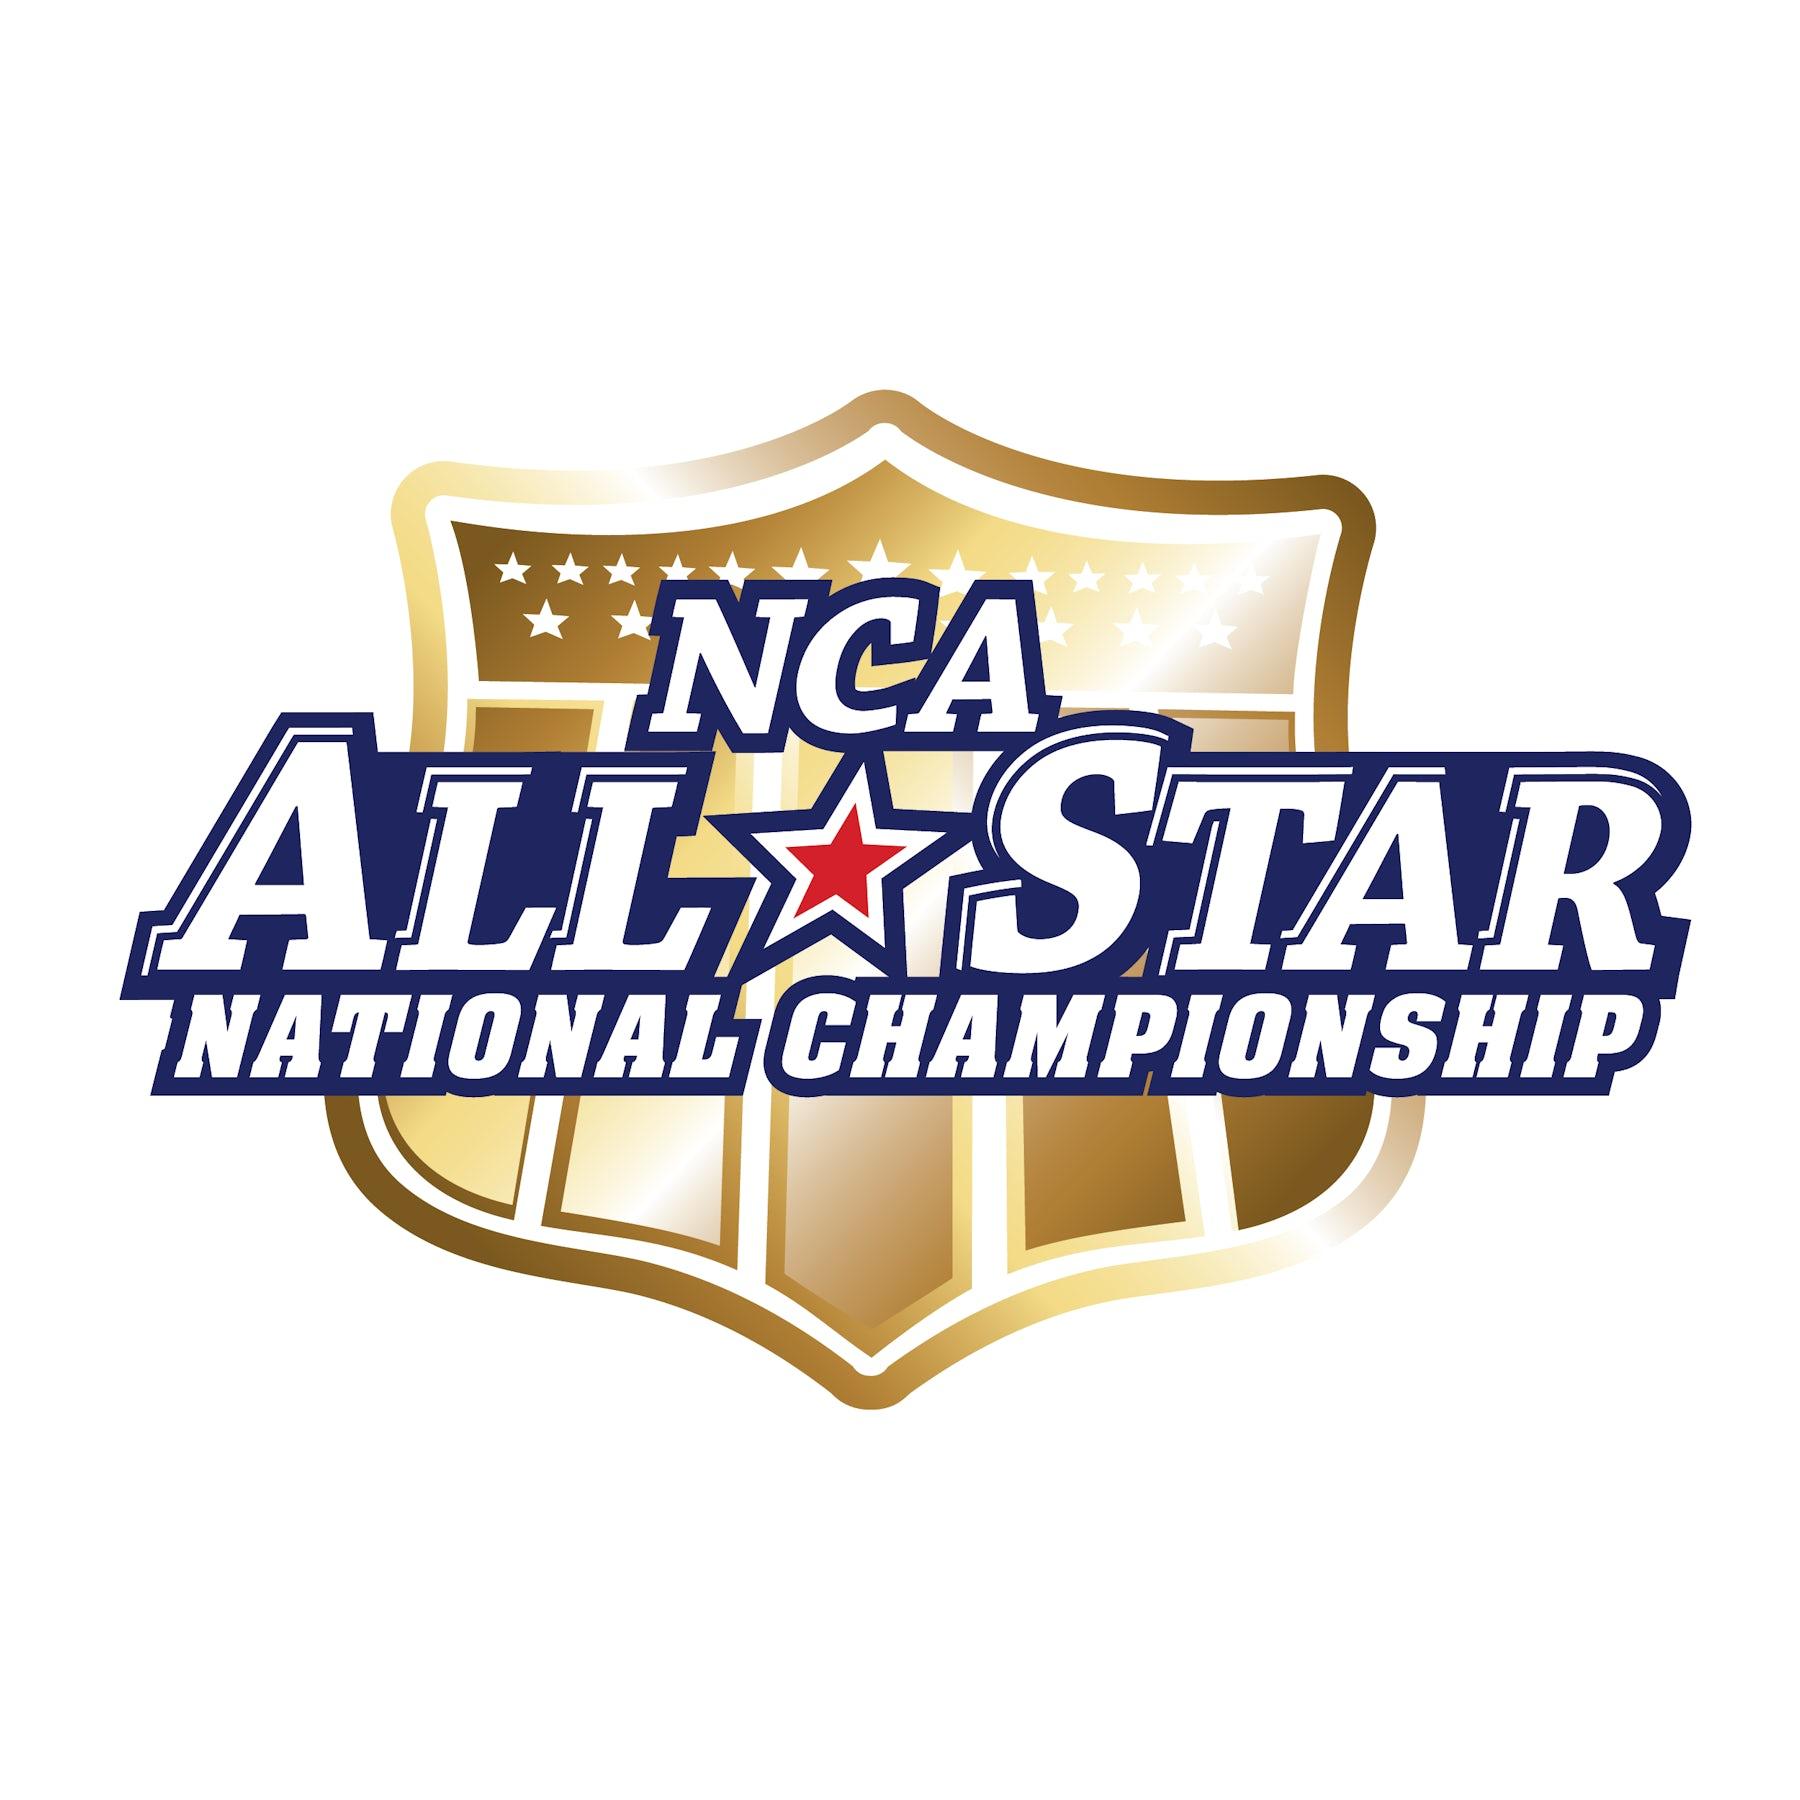 NCA All-Star National Championship Logo